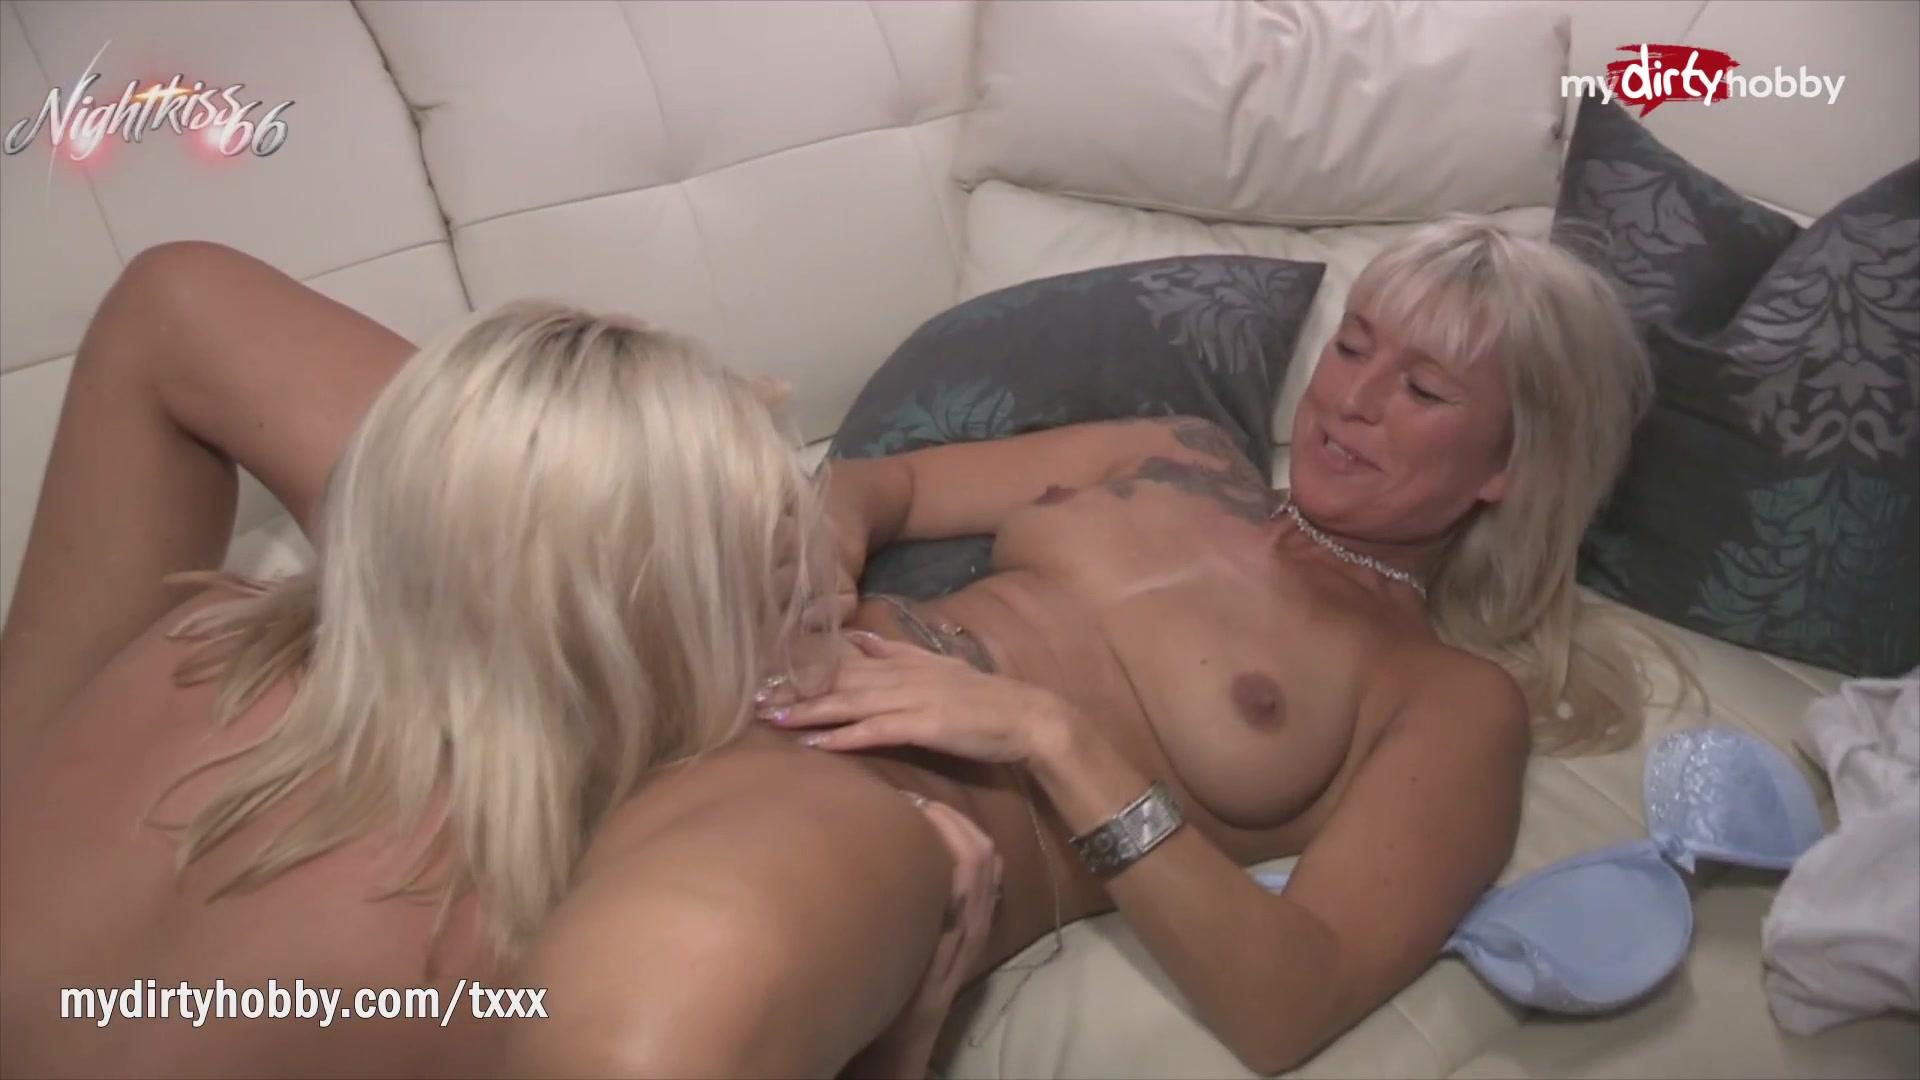 My Dirty Hobby - Mature ladies having fun mature bbw porn vids tree